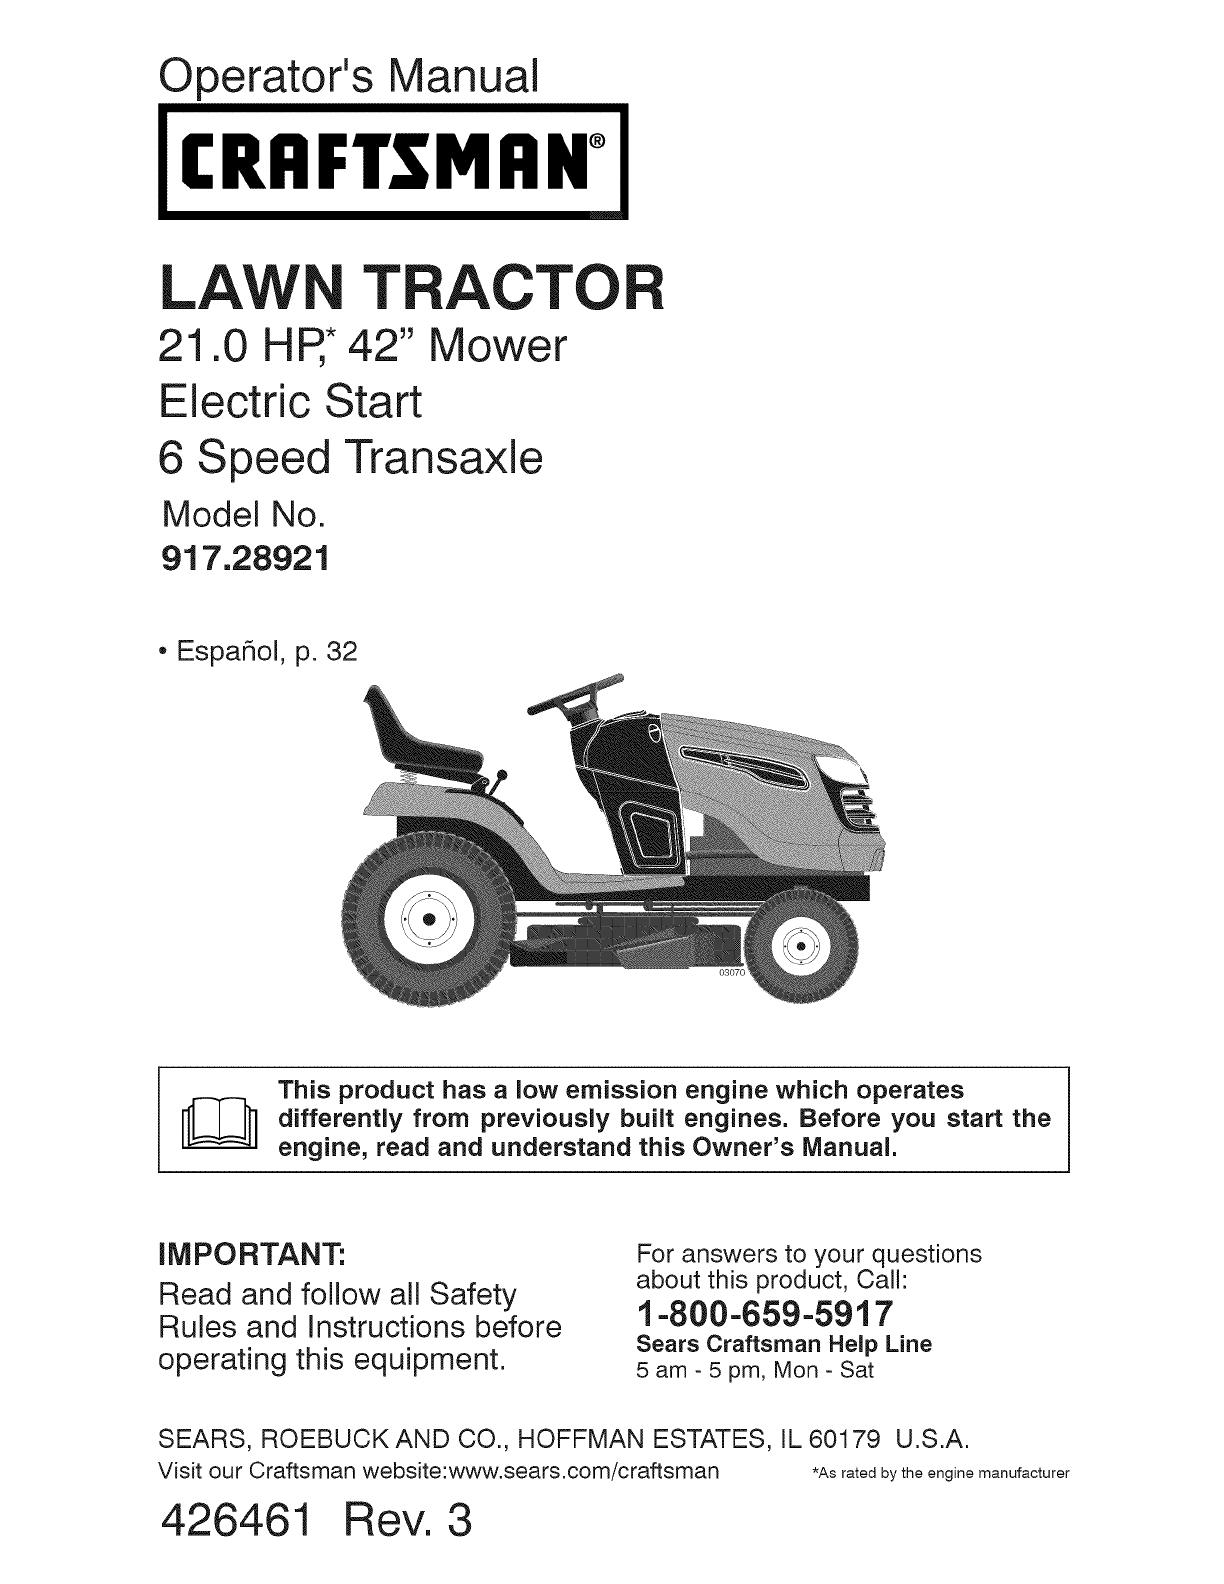 Craftsman 91728921 917289210 917289211 917289213 Yt 3000 Manual Sabre Riding Mower Wiring Diagram Law Tracto